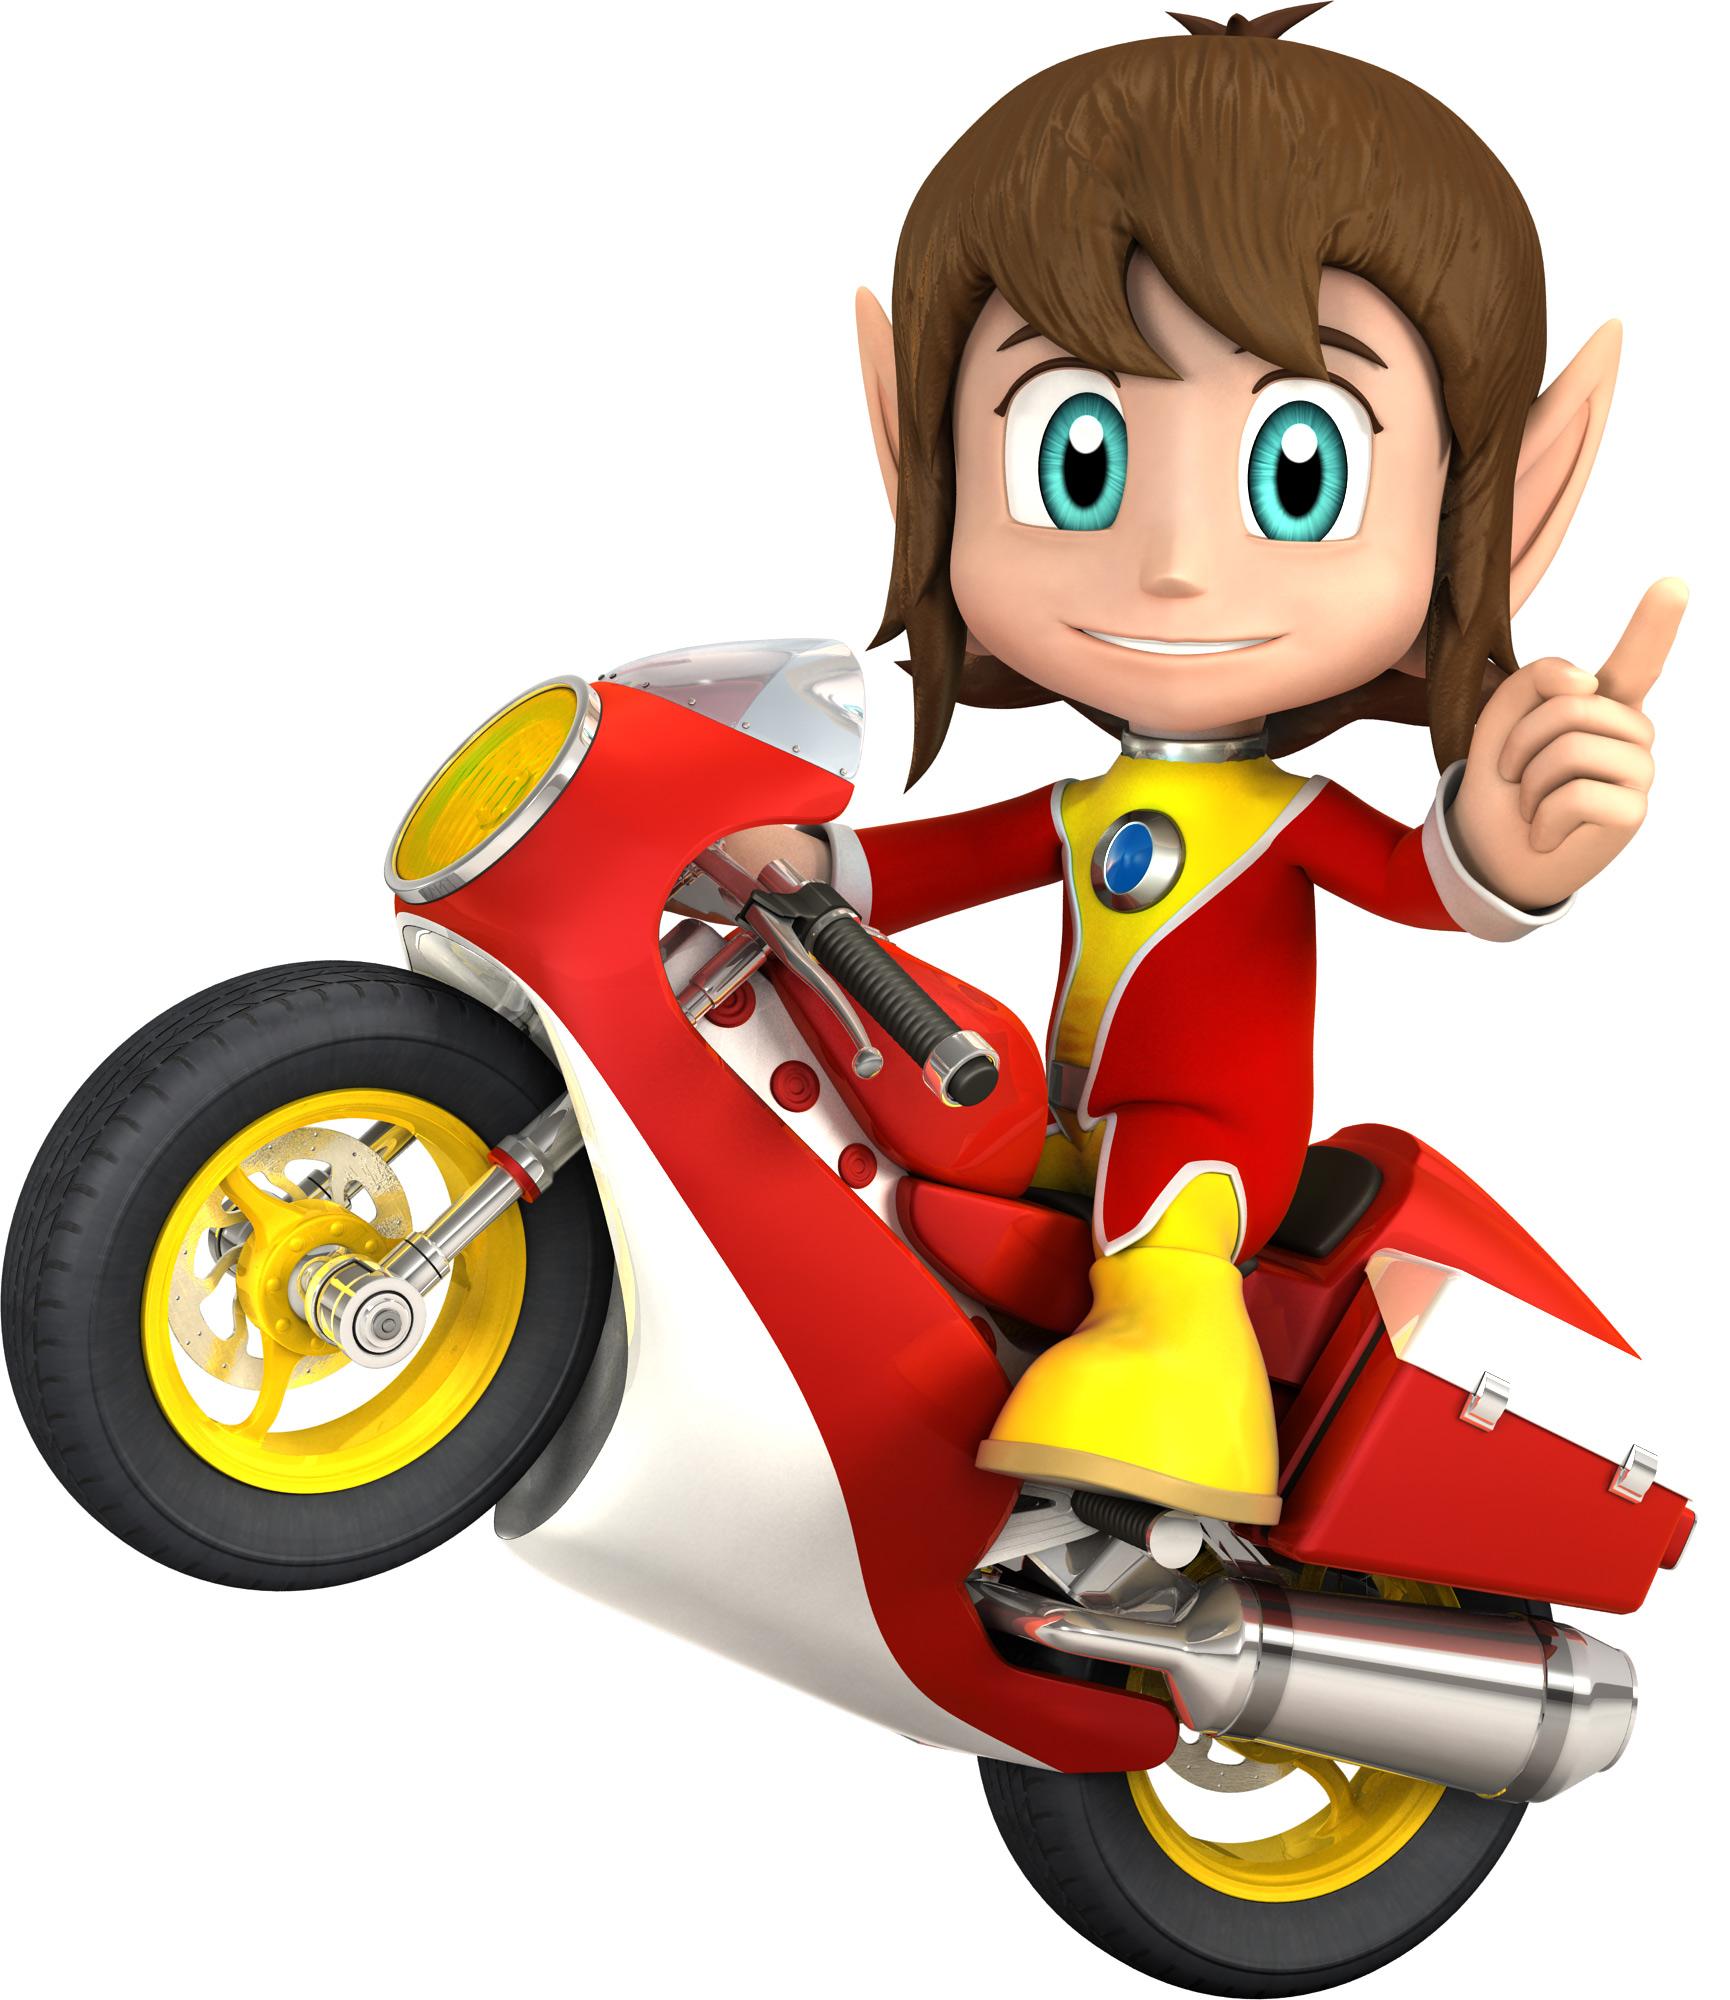 Motorcycle Kid Mascots